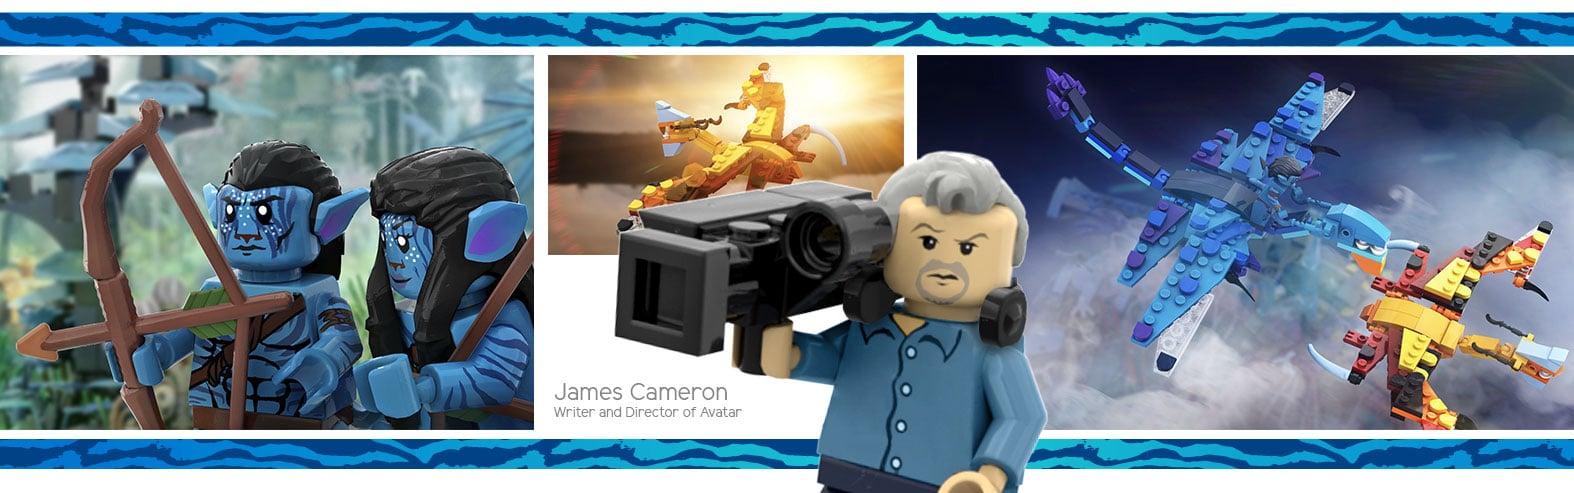 LEGO Ideas Avatar Pandora World (16)